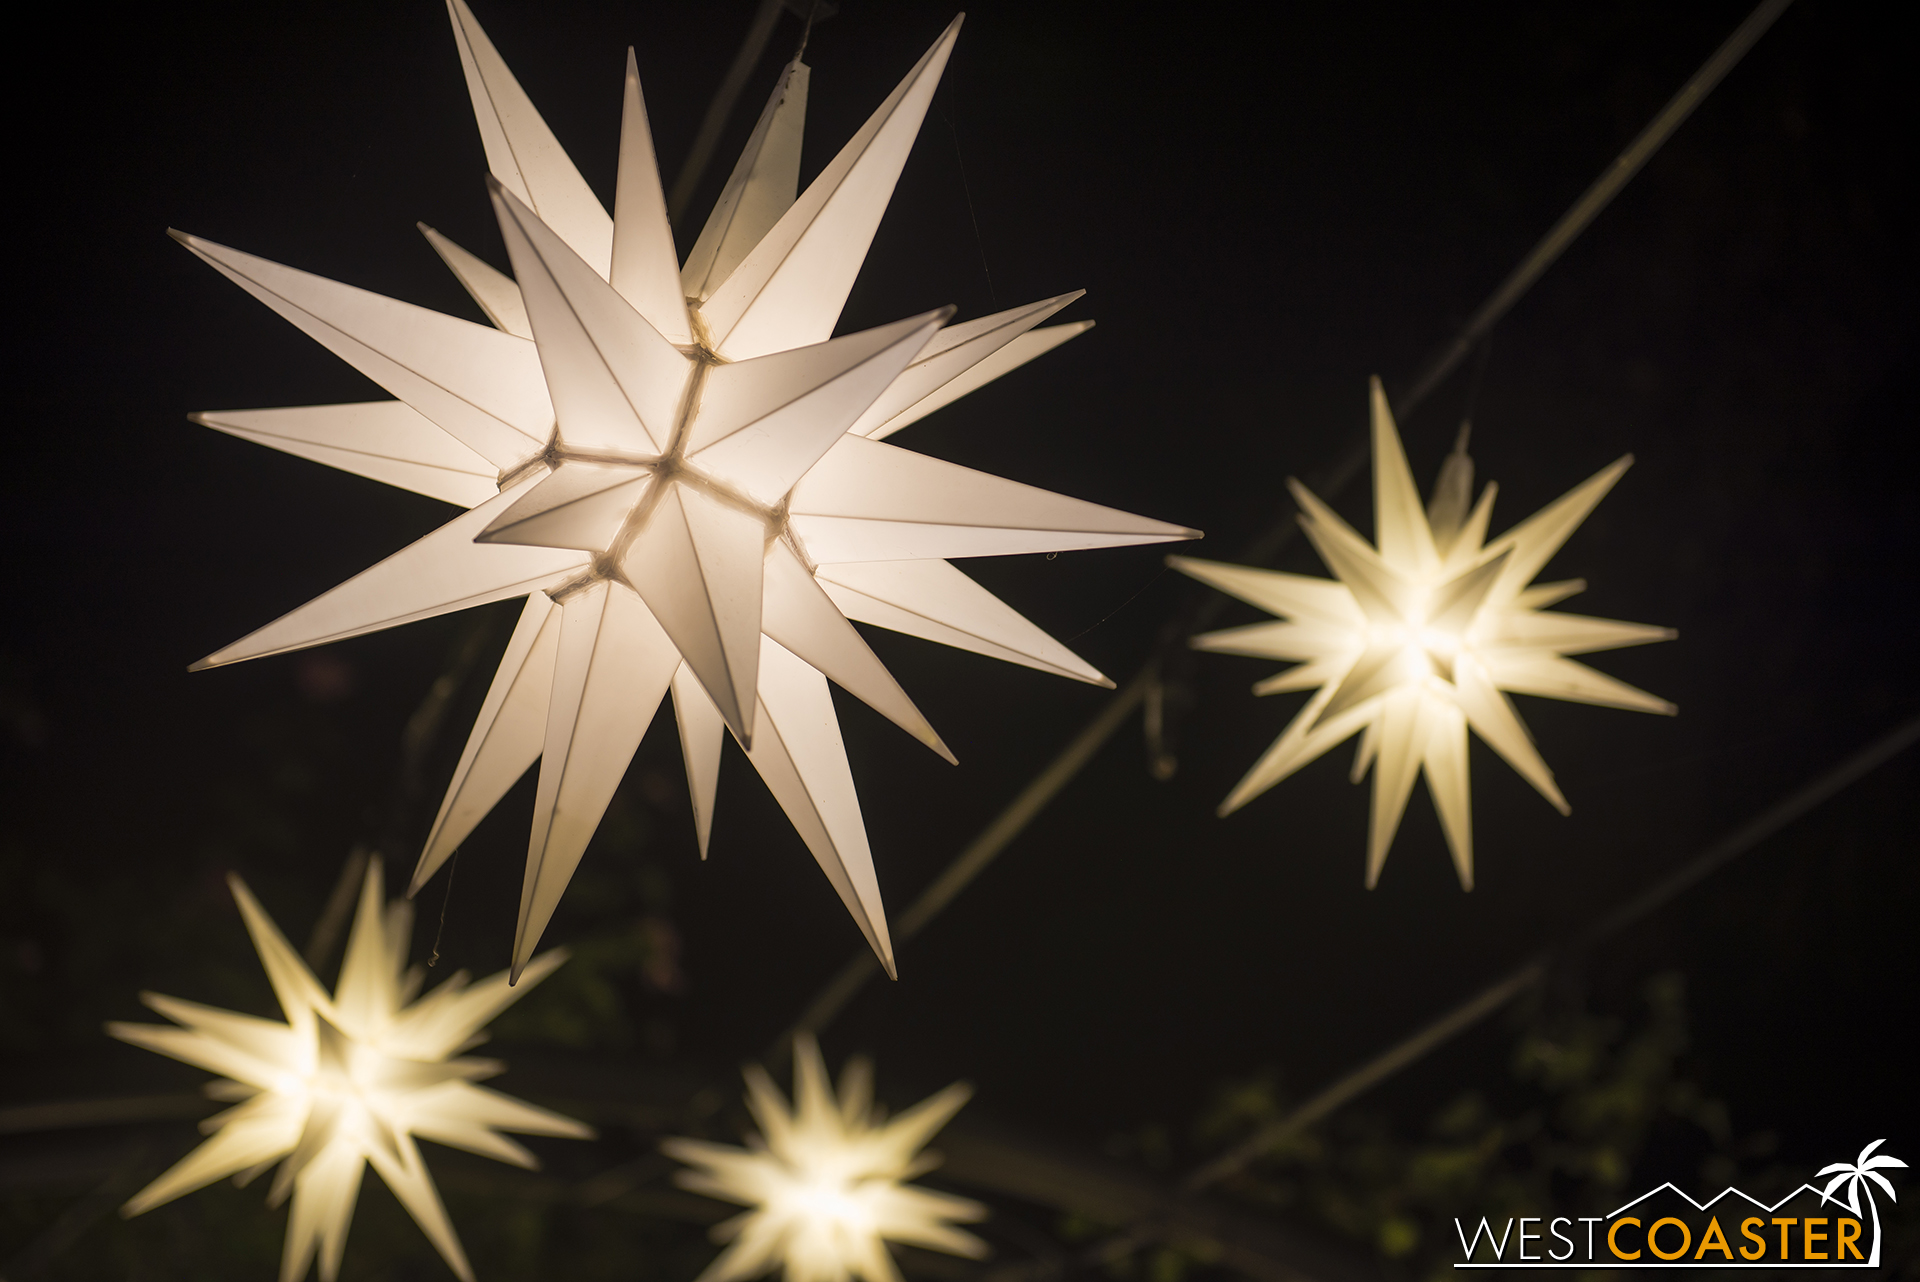 Descanso-17_1201-03-StarlightGarden-0002.jpg